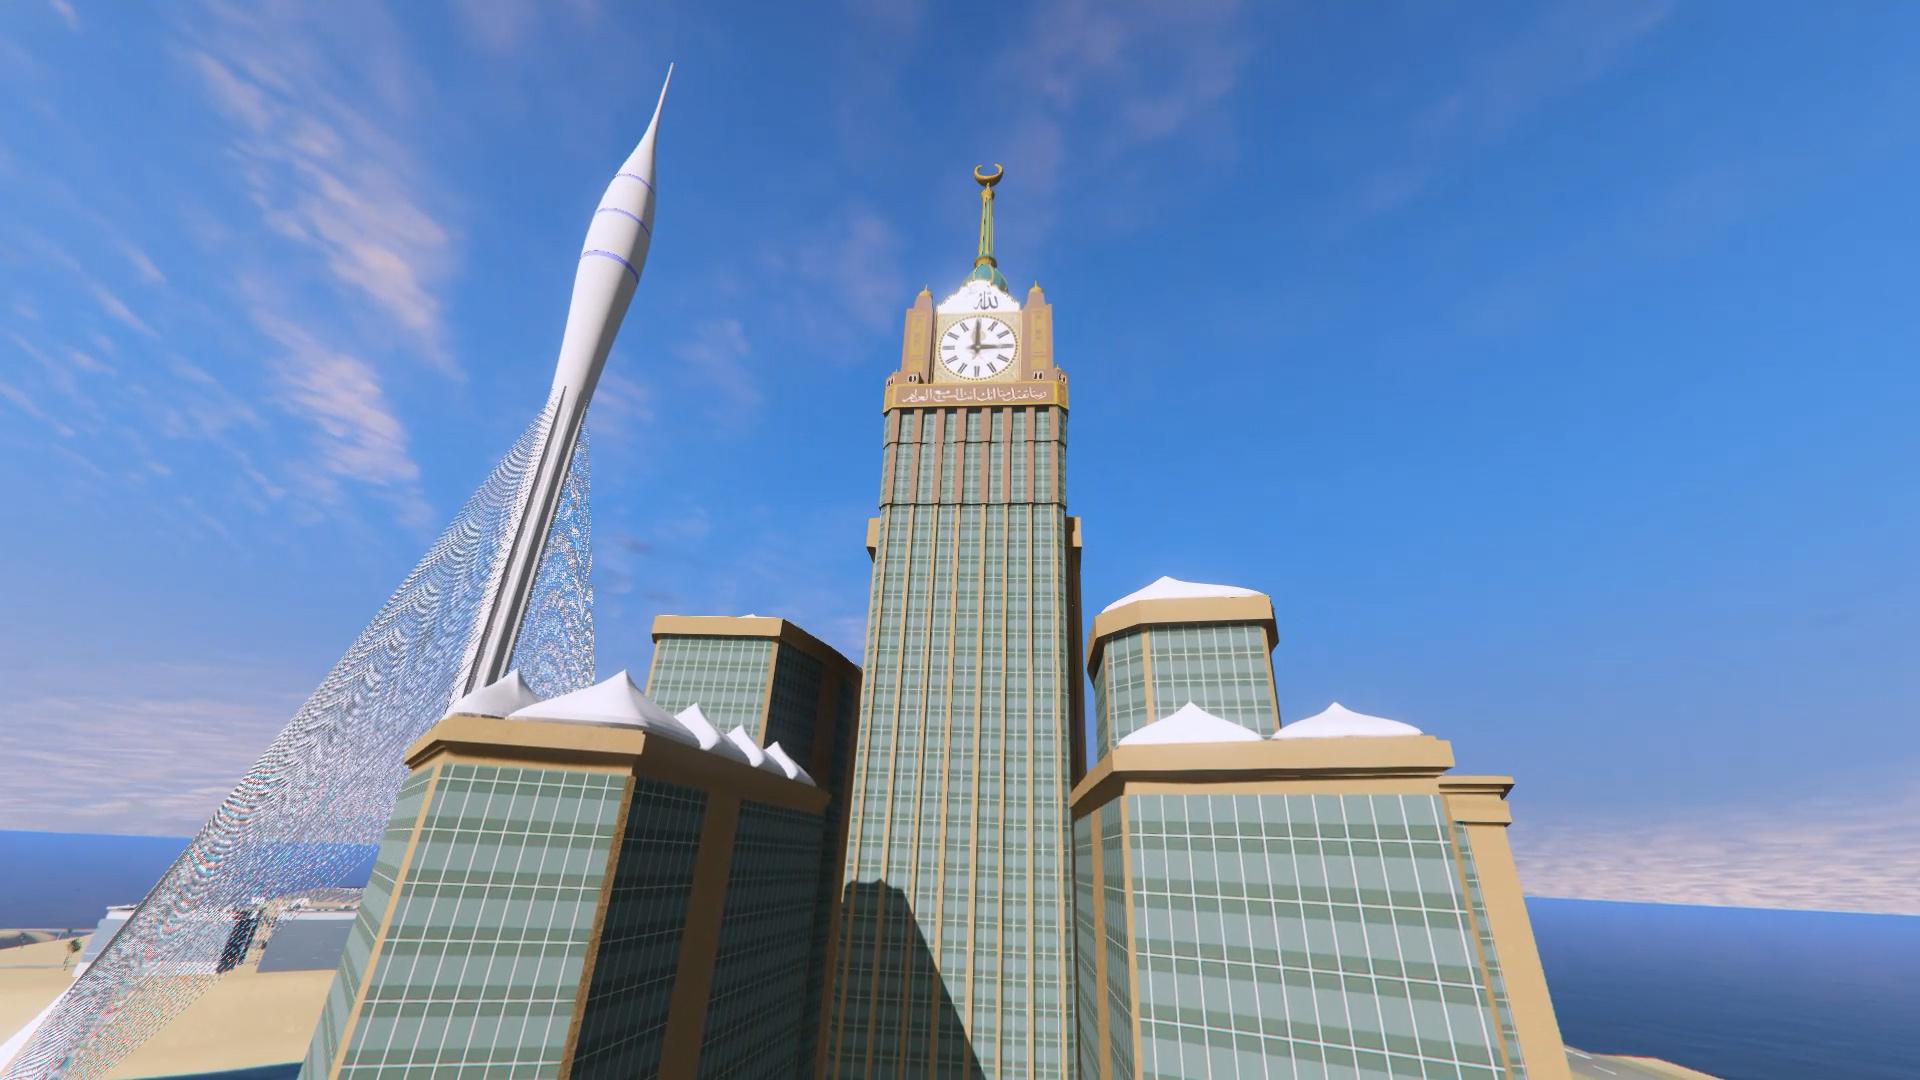 GTA: Dubai Islands [Add-on Map] - GTA5-Mods.com on